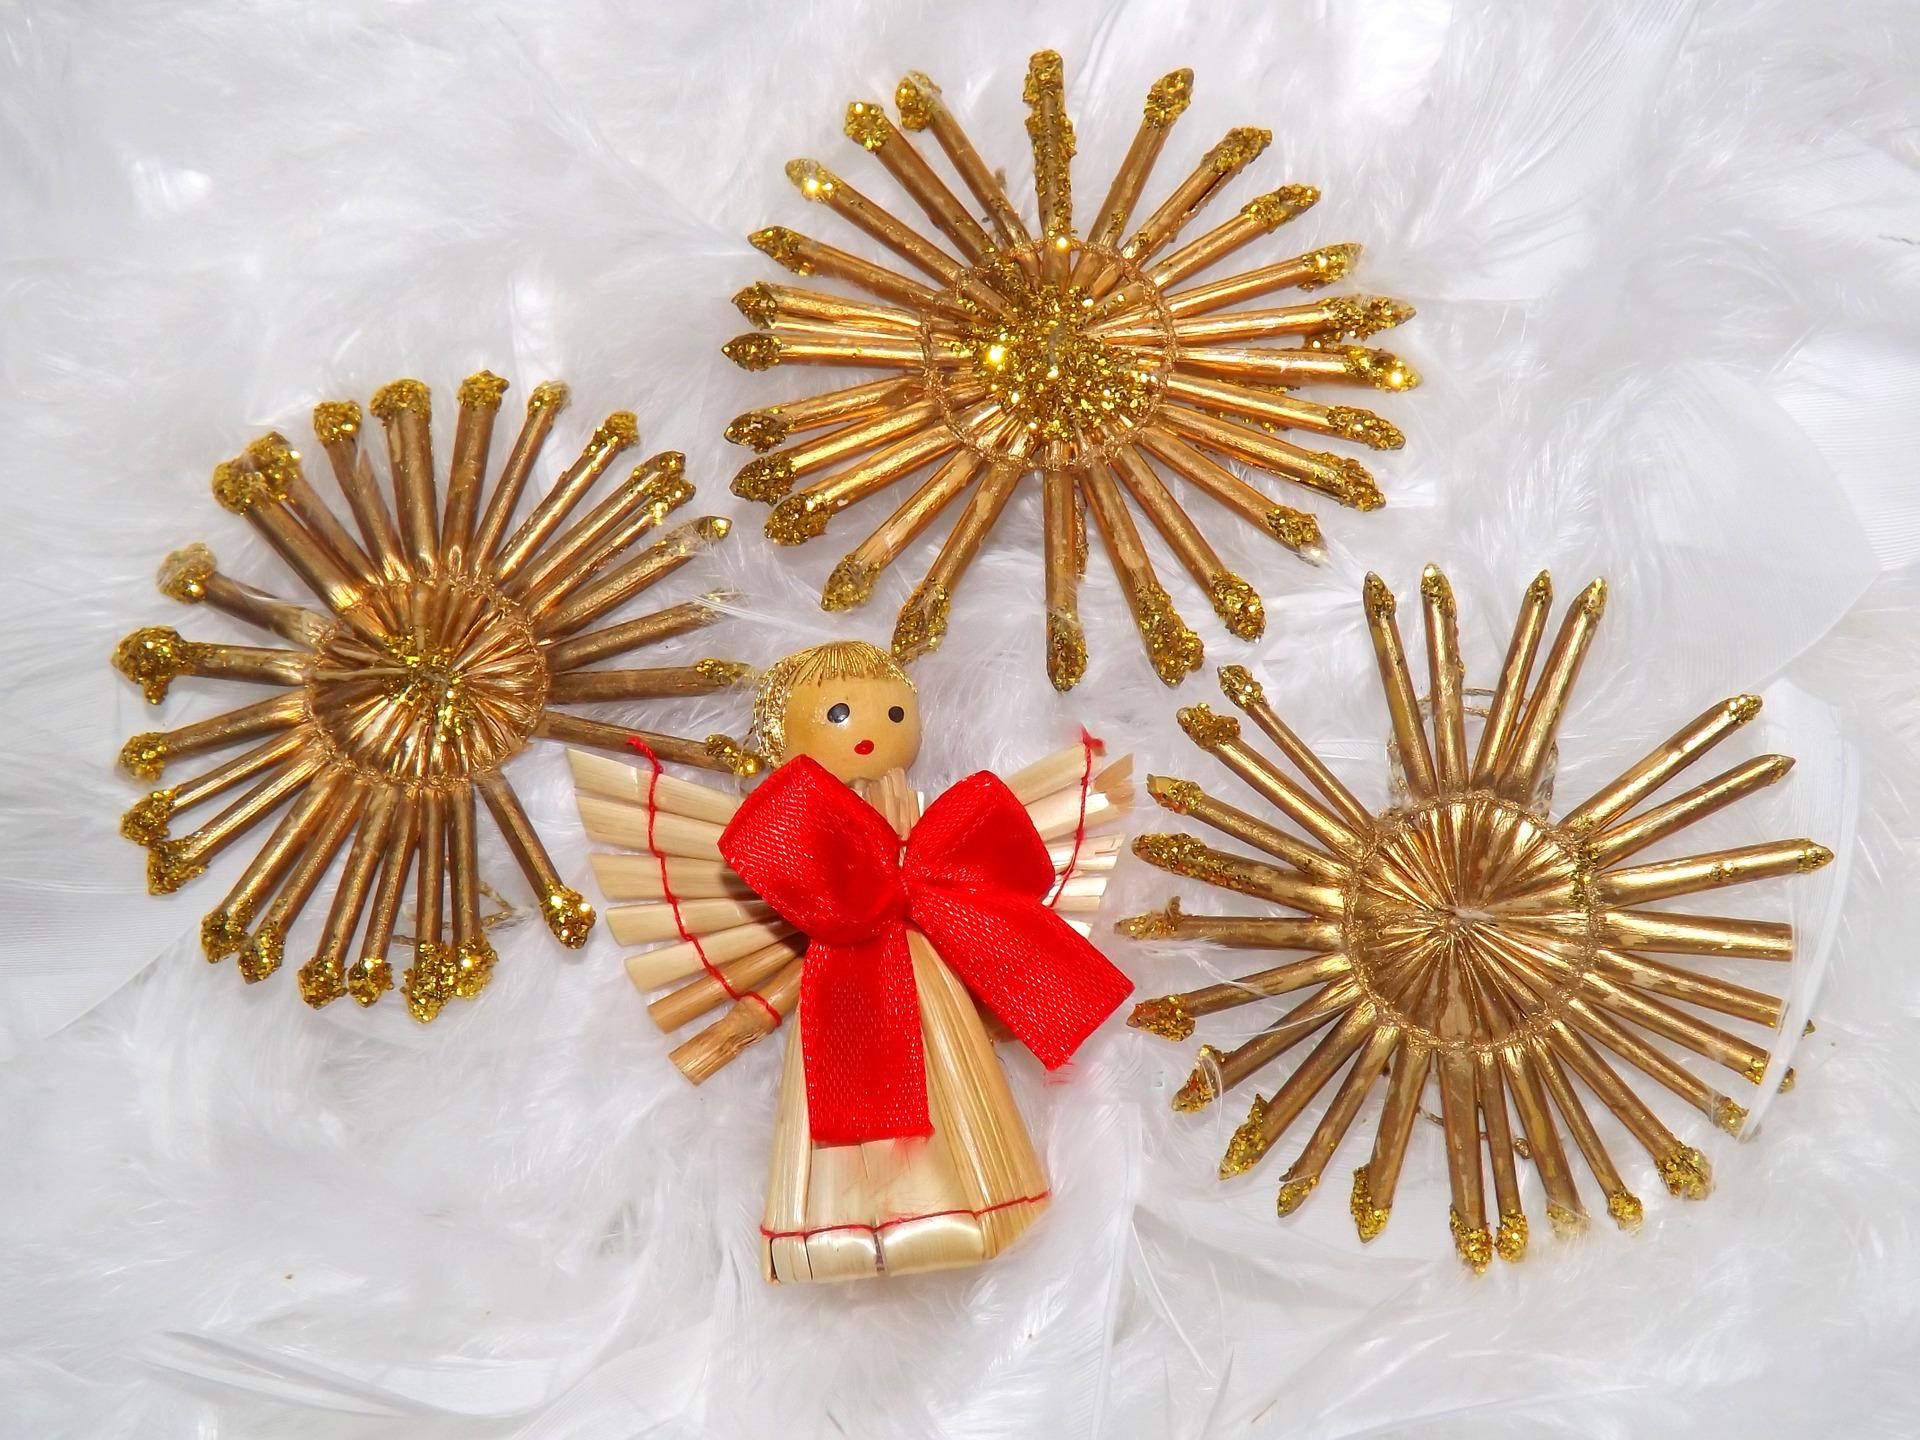 Christmas, Decorate, Decoration, Season, Toy, HQ Photo